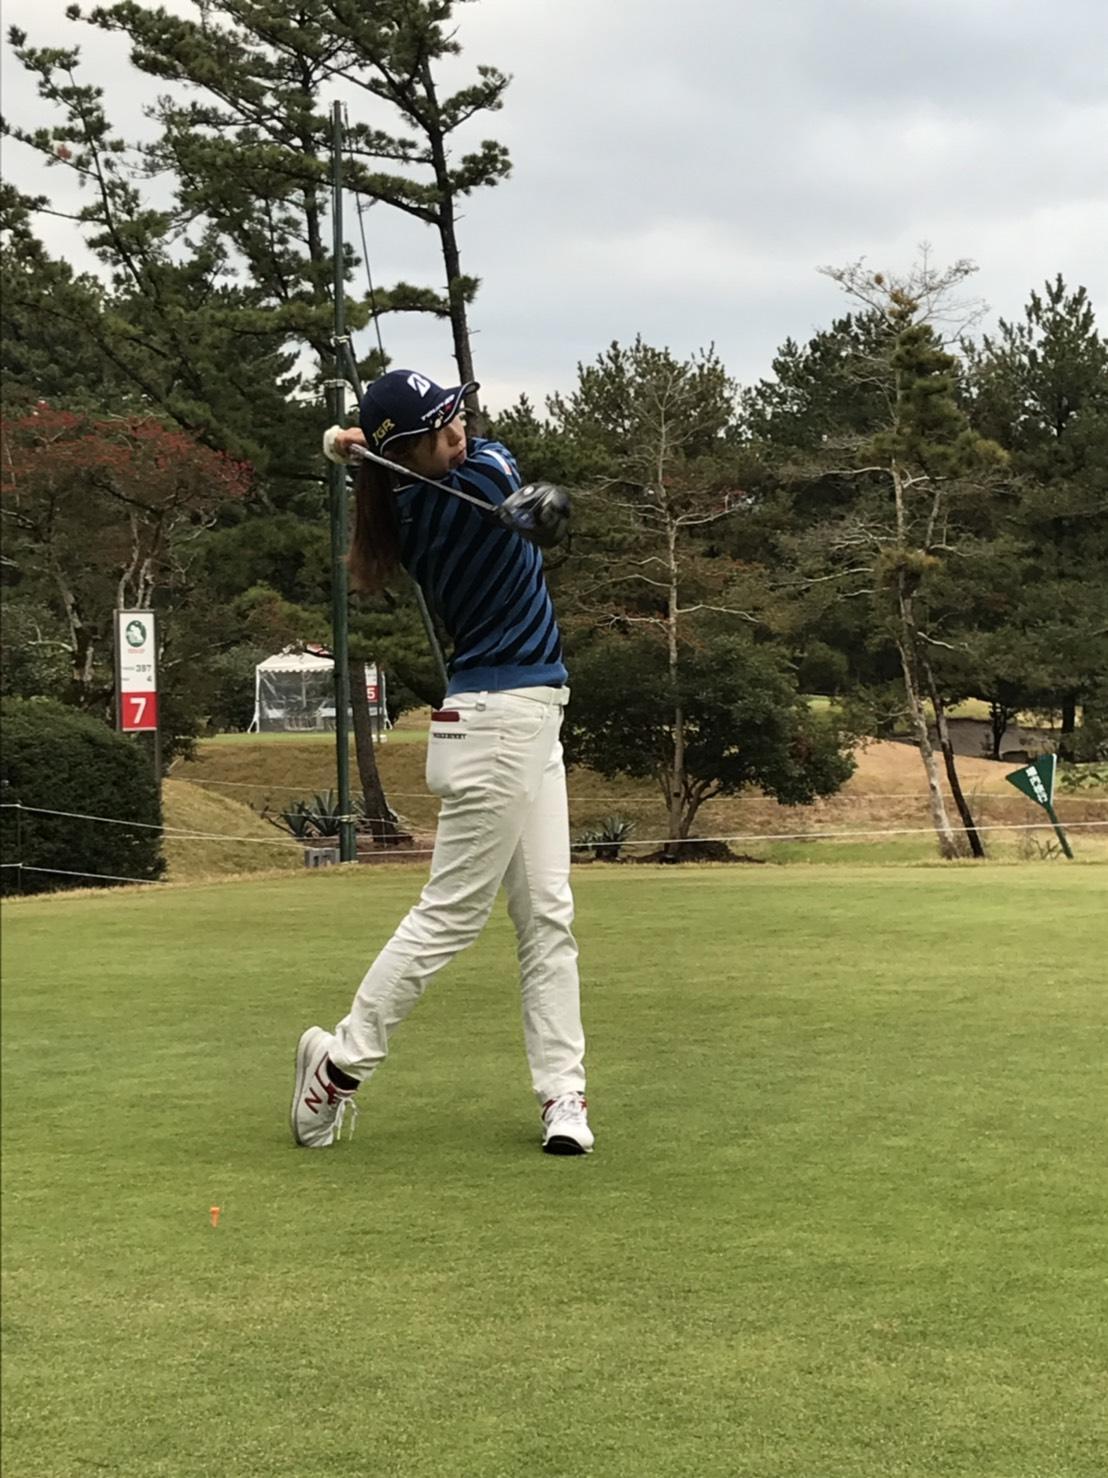 http://www.bs-golf.com/pro/33be9c7bffa1555ed6cfe31772c8cfff2610adc5.JPG